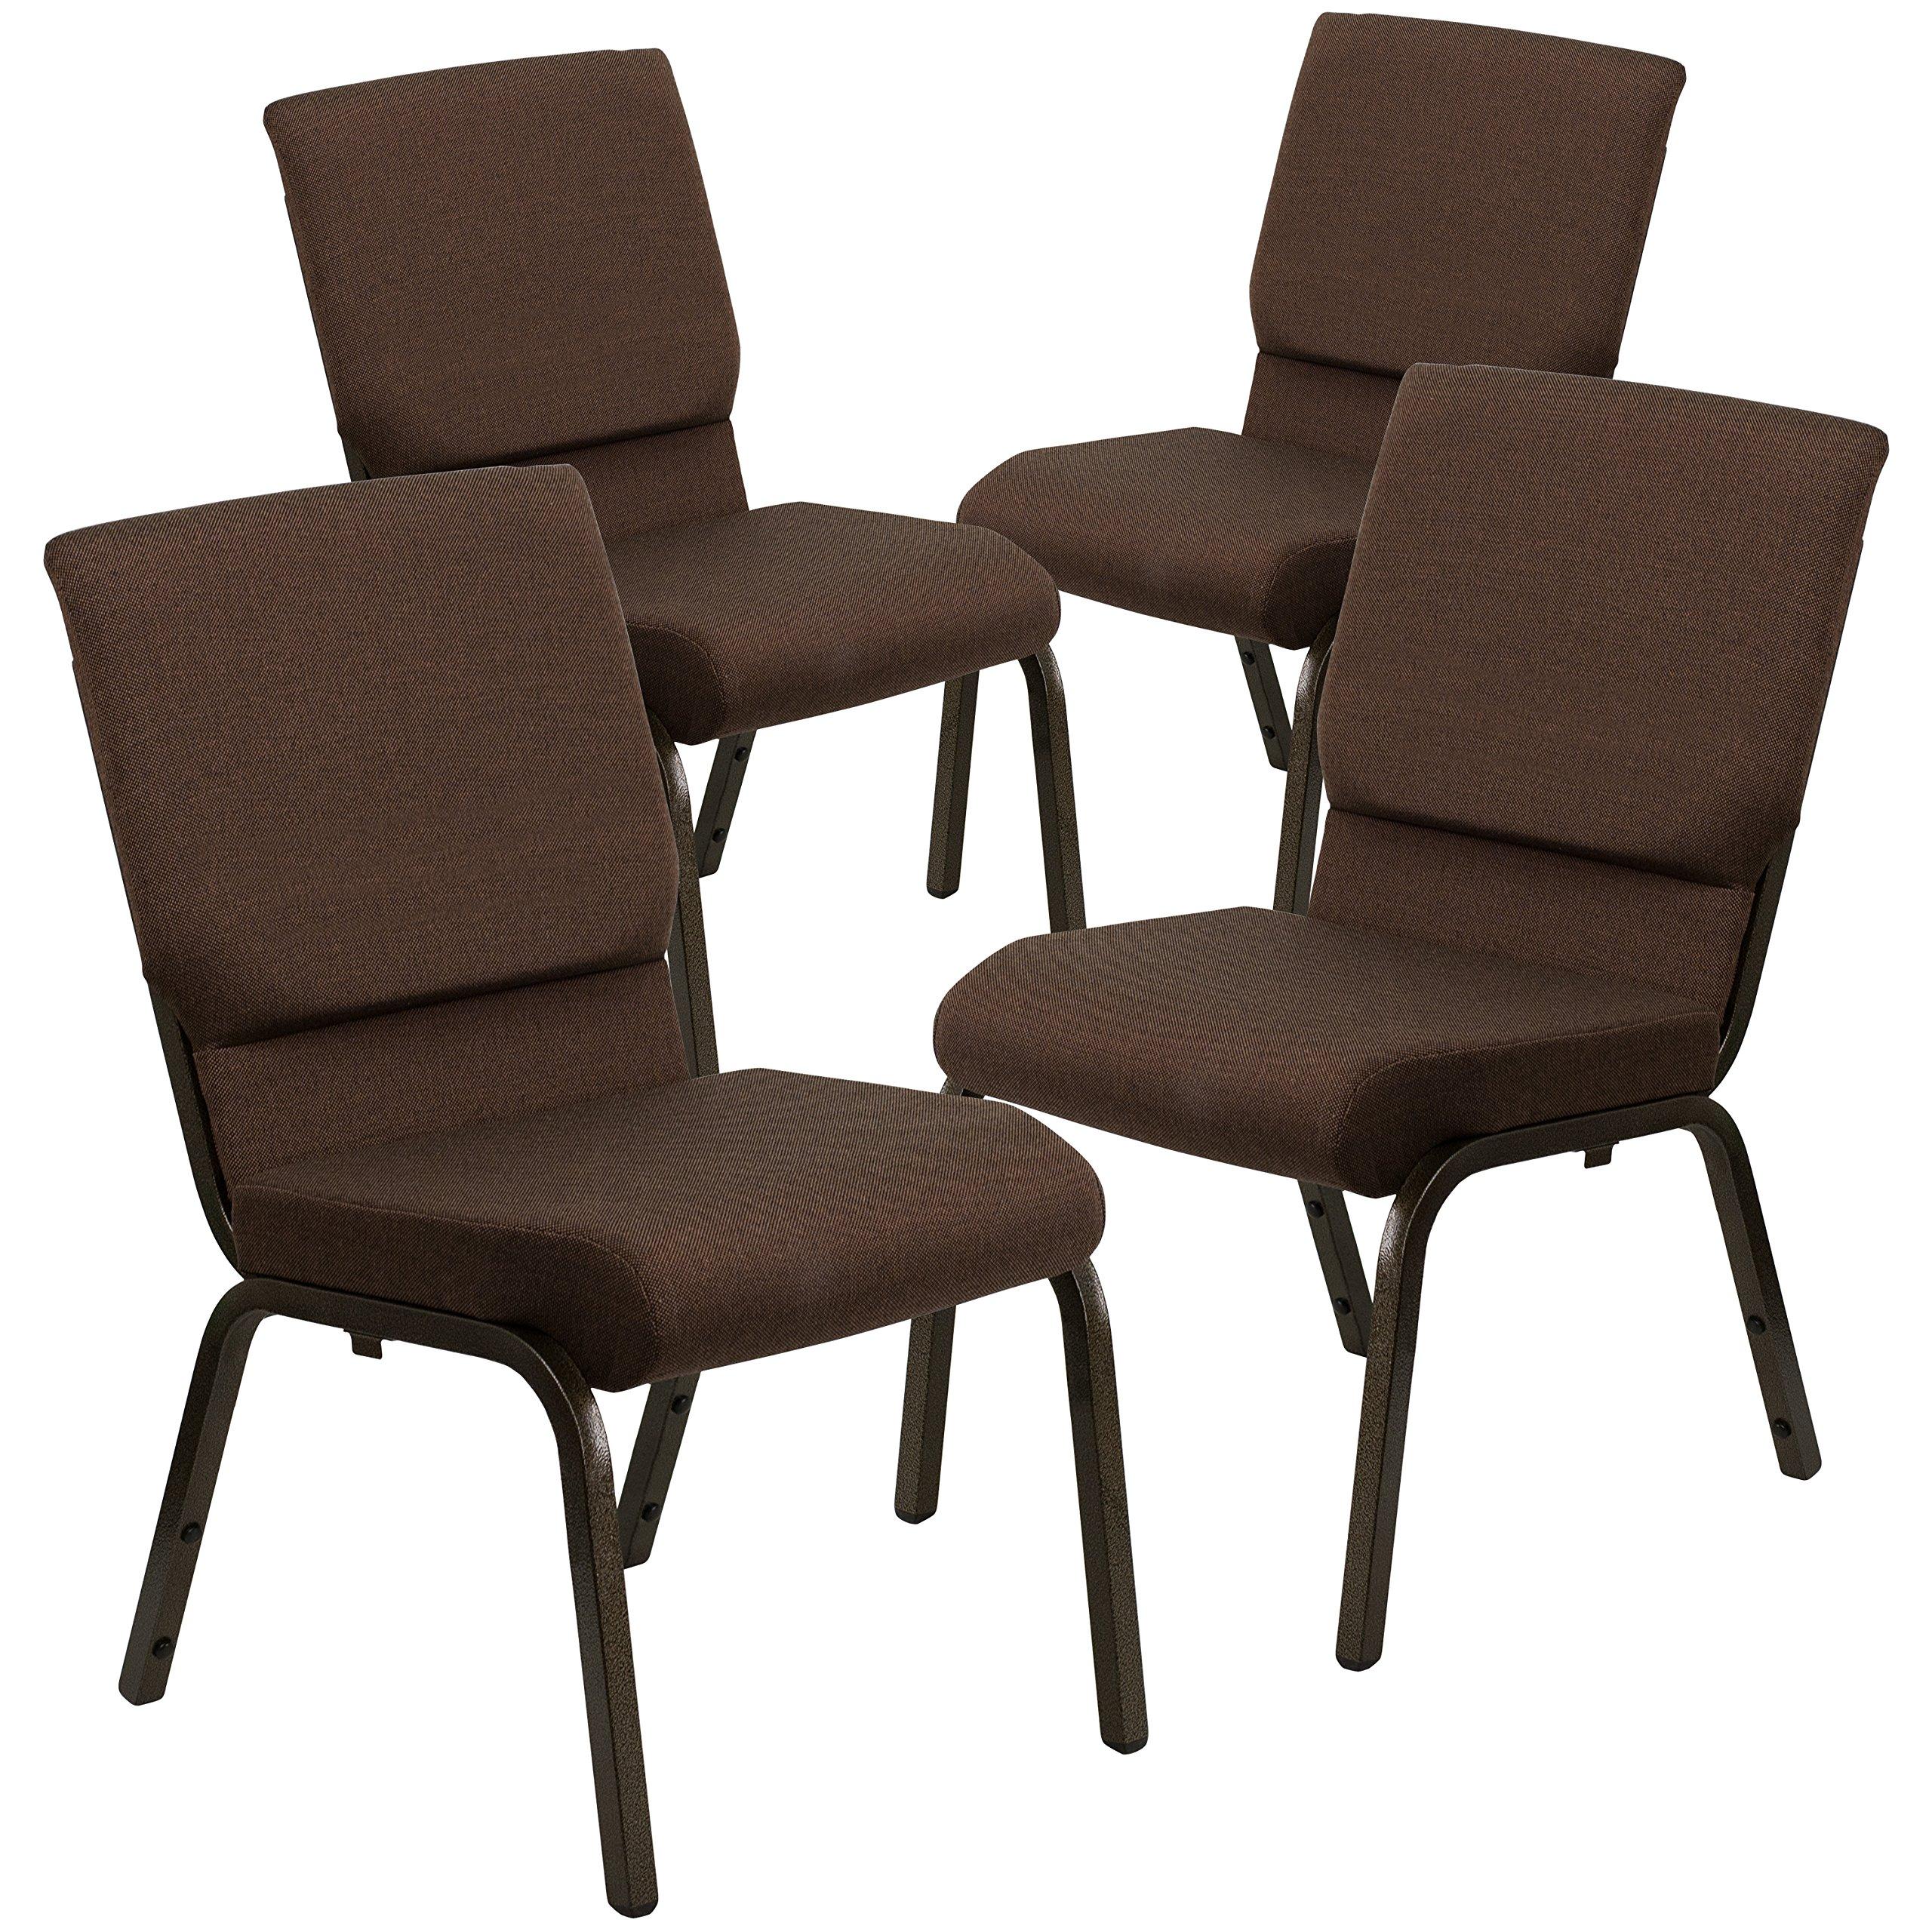 Flash Furniture 4 Pk. HERCULES Series 18.5''W Stacking Church Chair in Brown Fabric - Gold Vein Frame